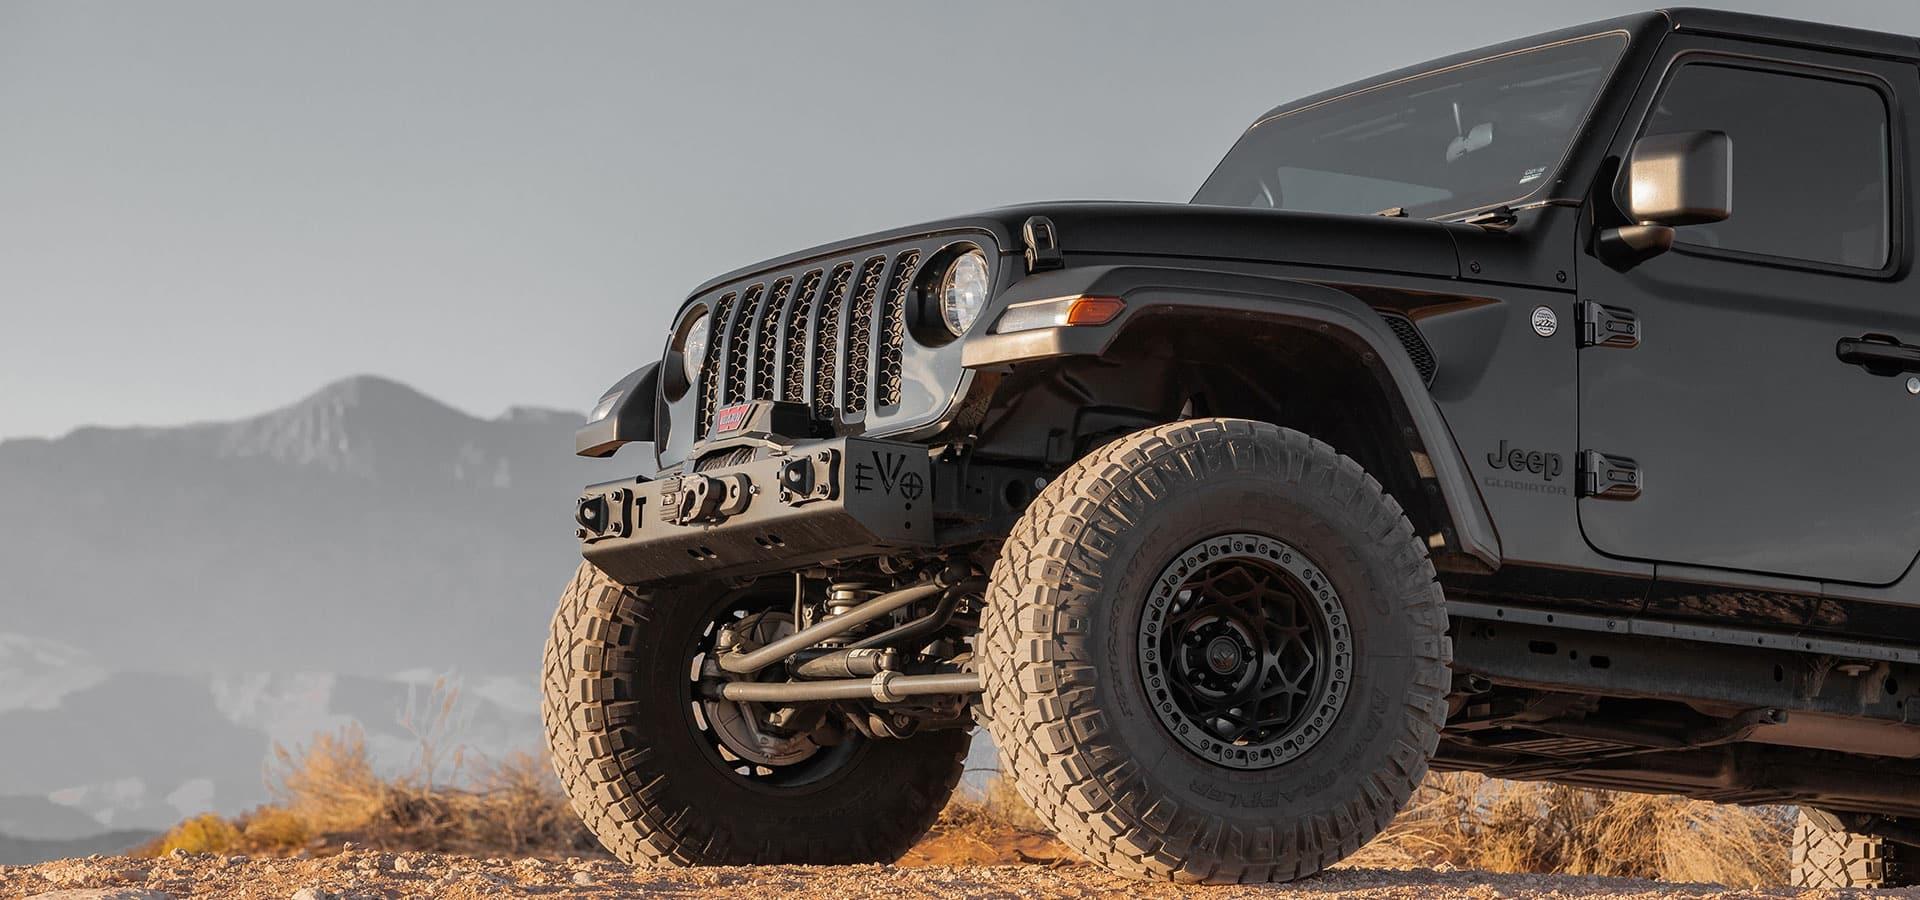 fuel-poster-jeep-gladiator